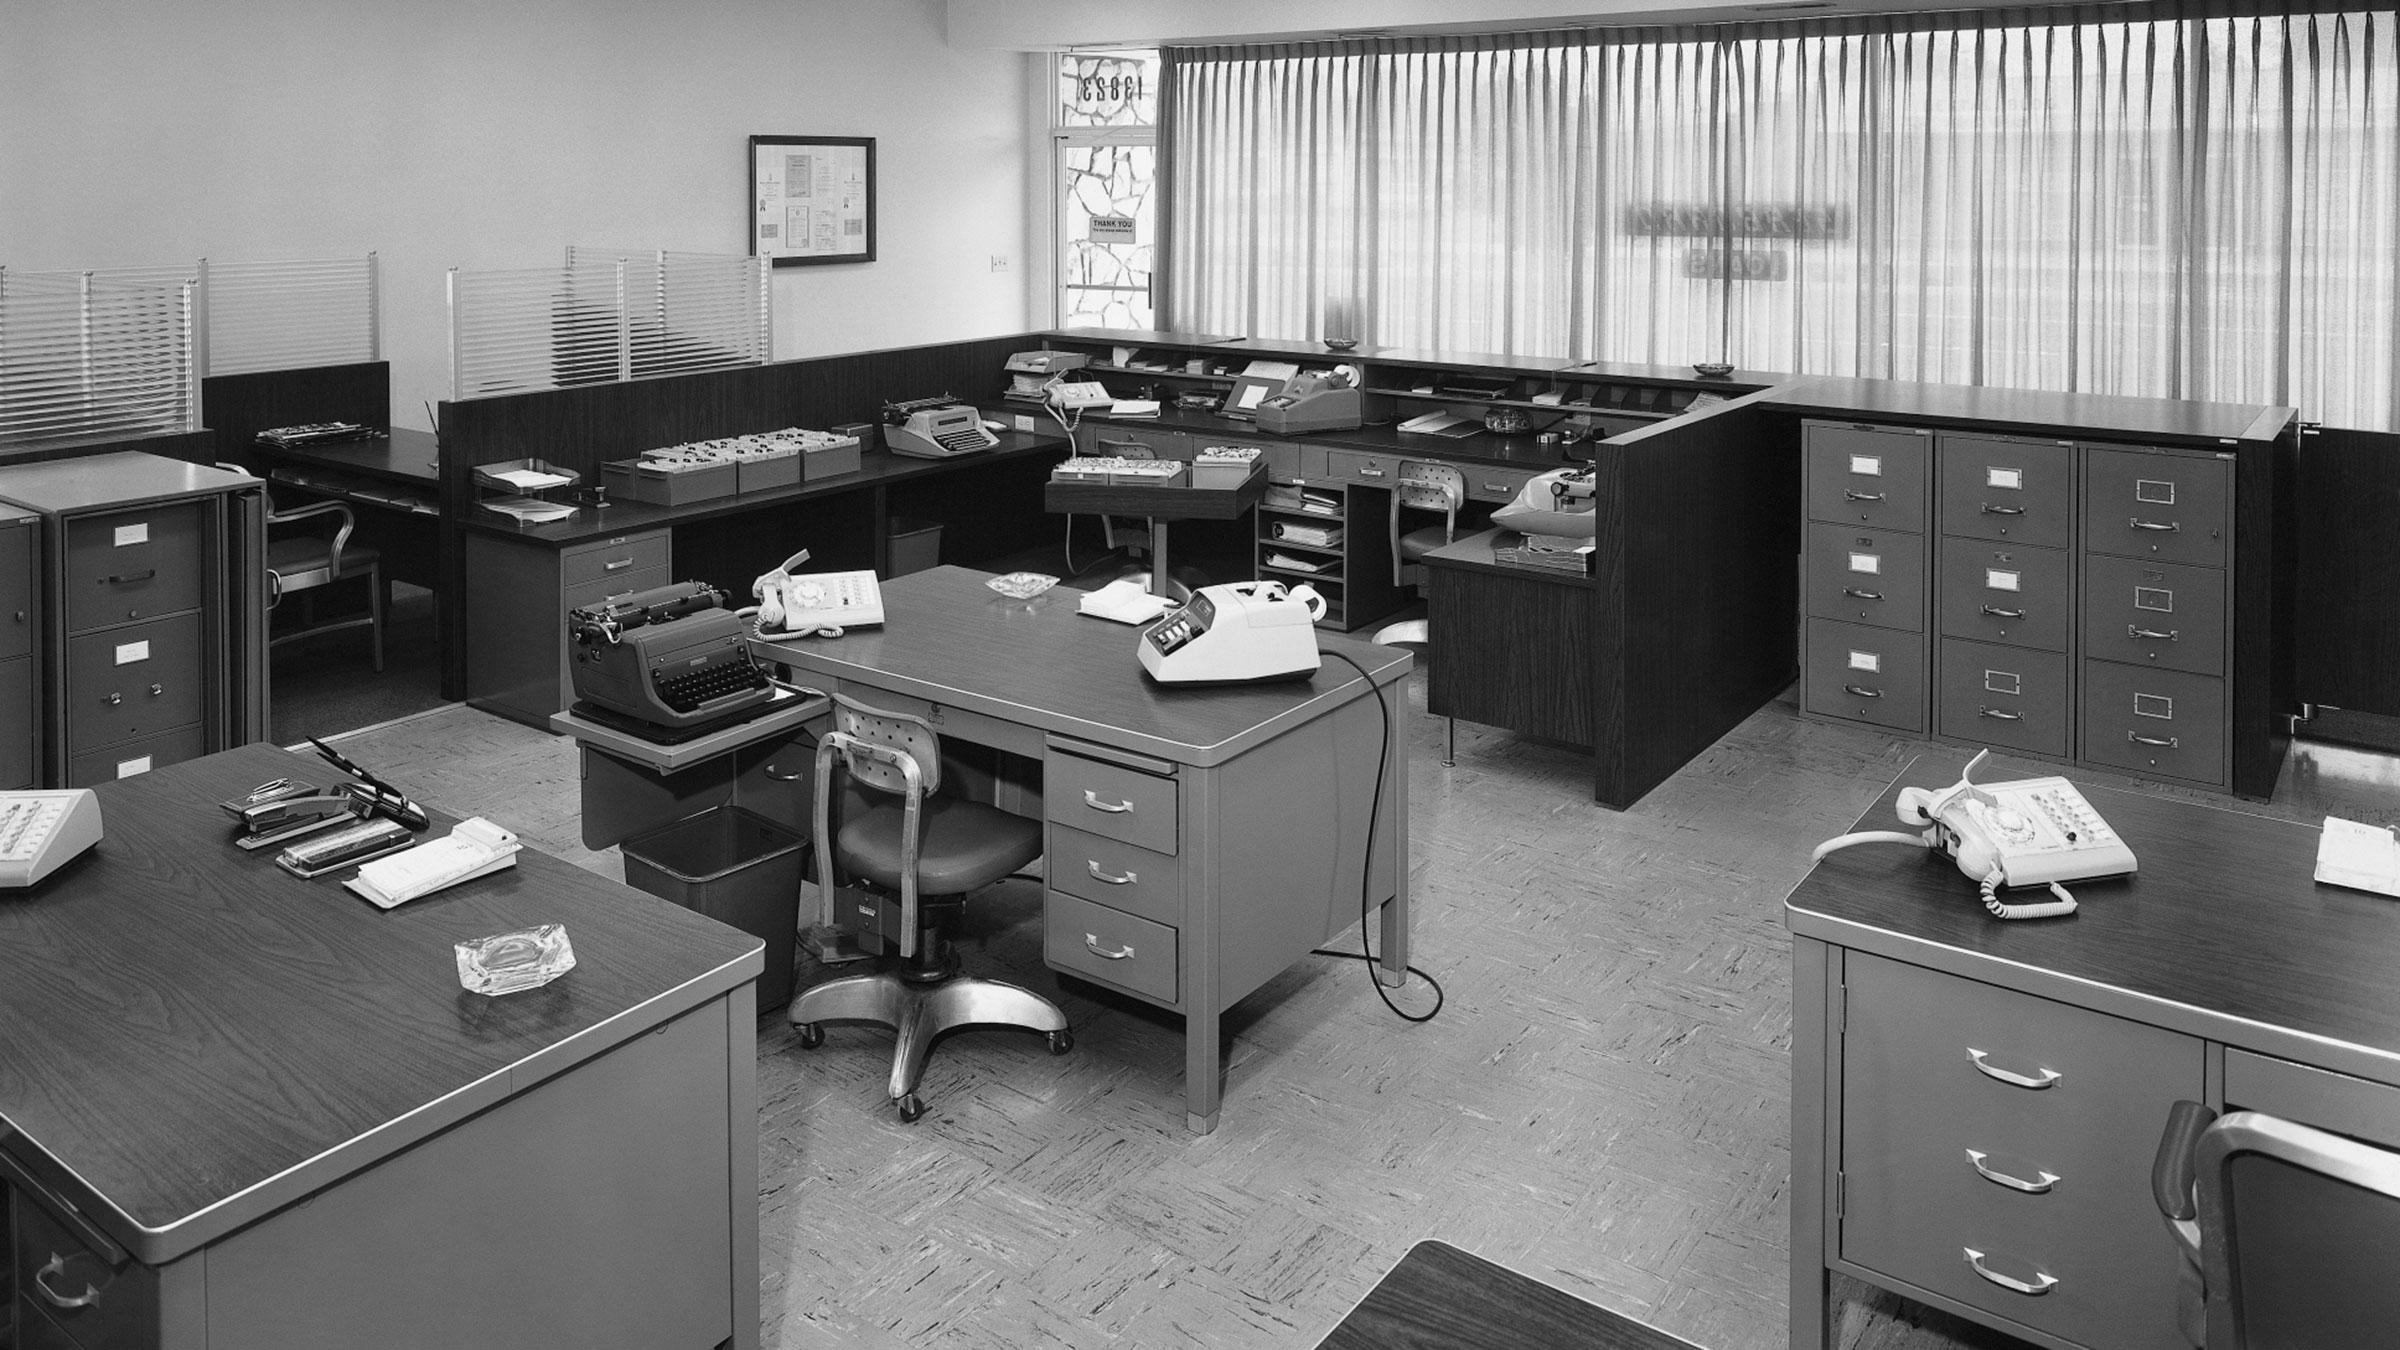 Office Intern 10262012